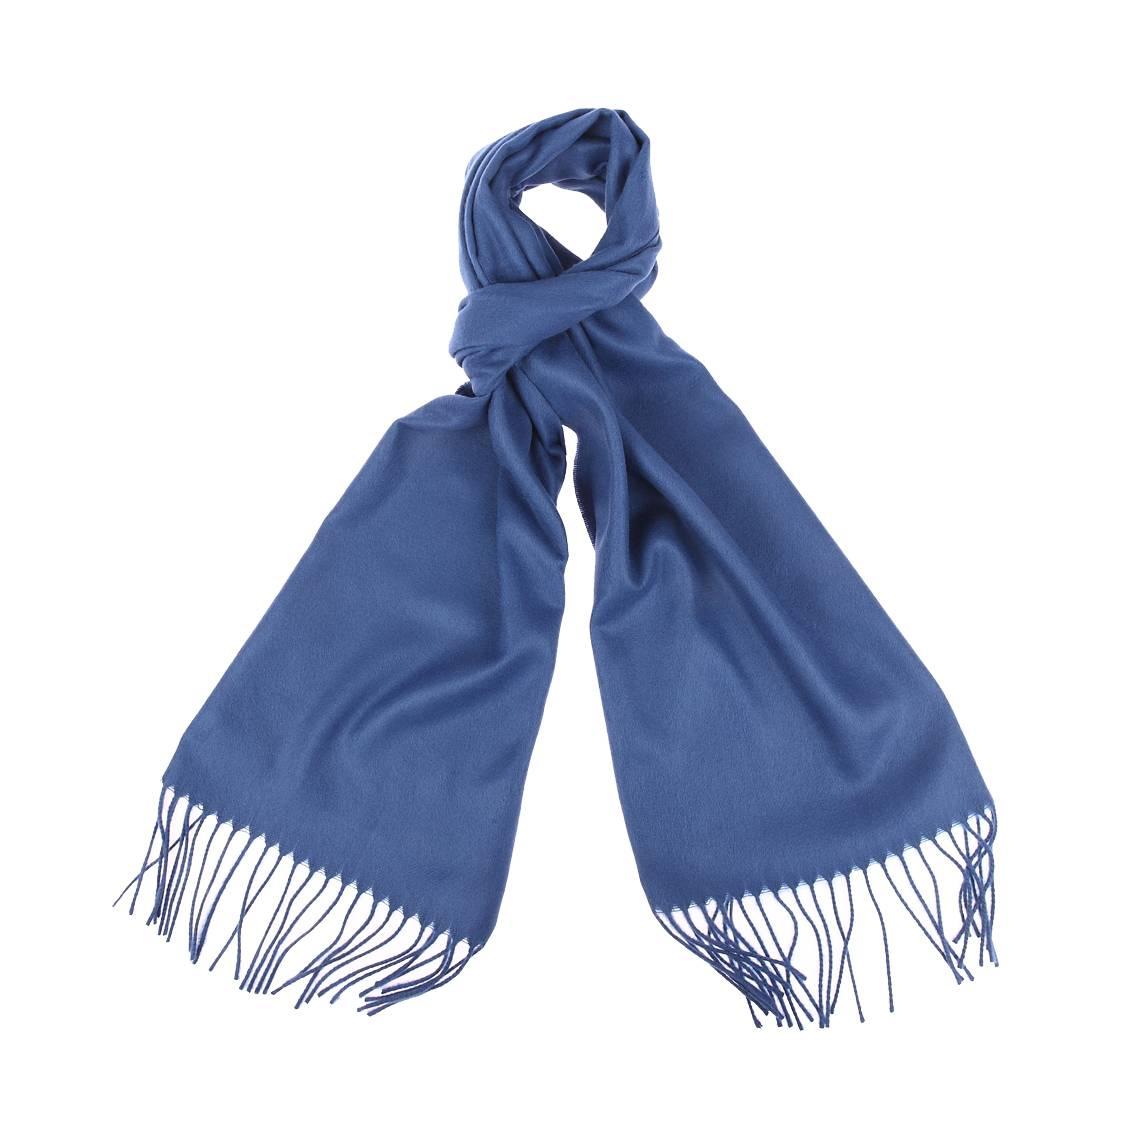 Echarpe douce  bleu indigo